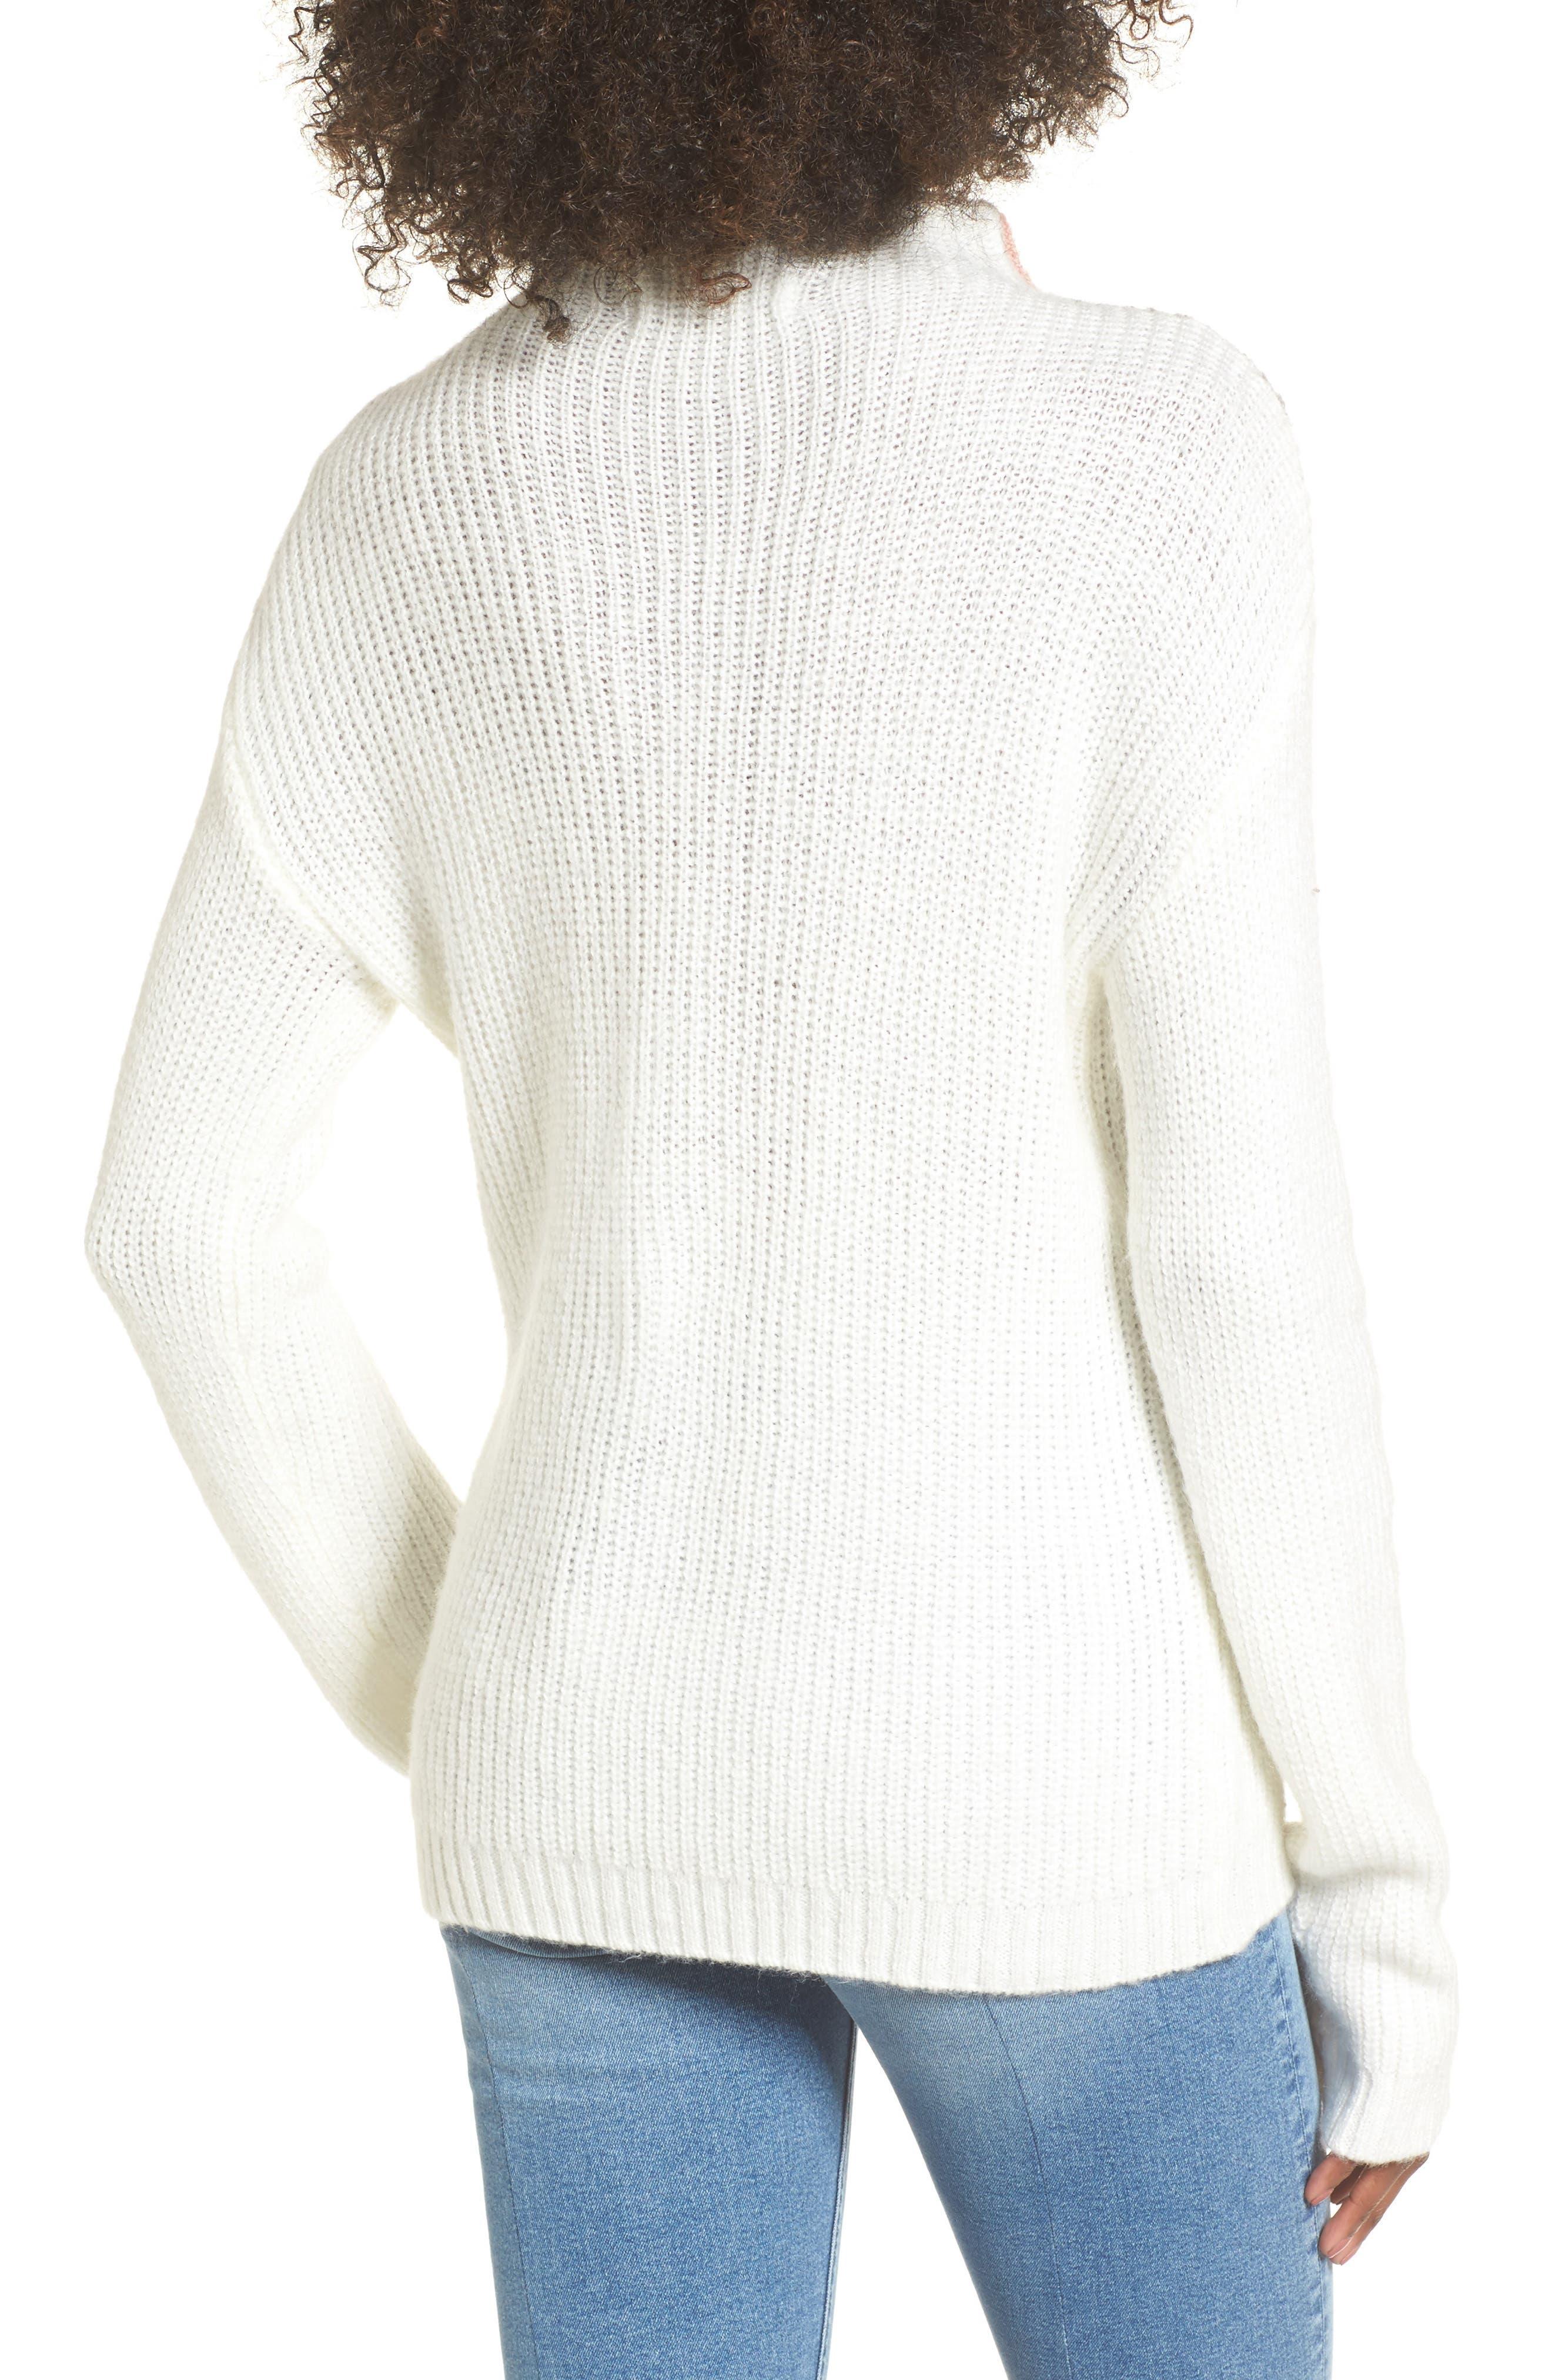 Alternate Image 2  - Cotton Emporium Tri-Color Après Ski Sweater